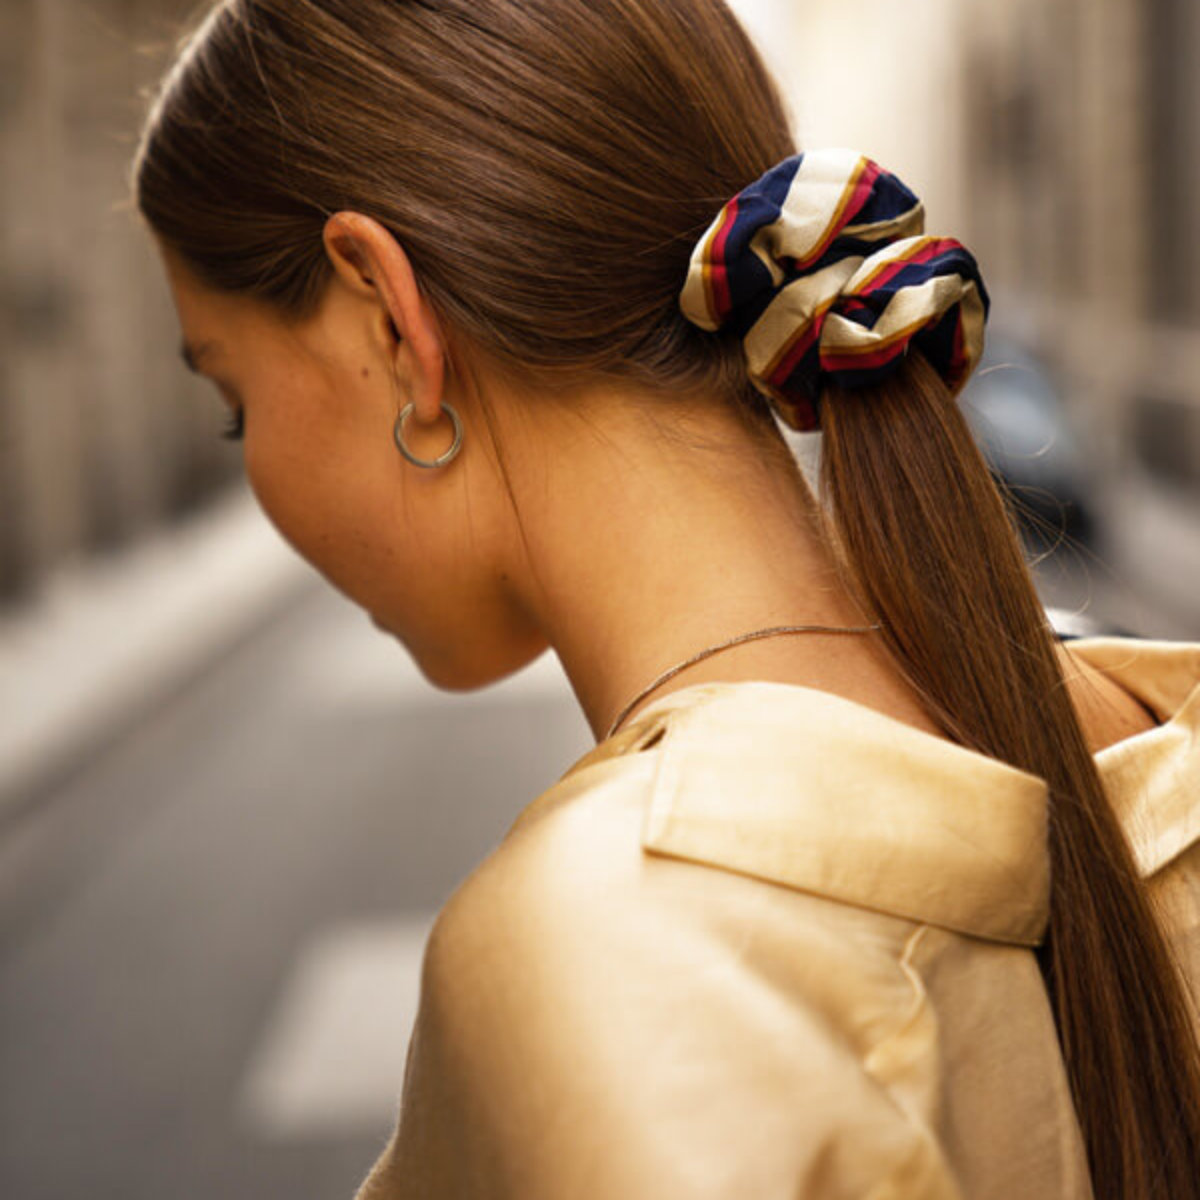 Womens hair in scrunchie